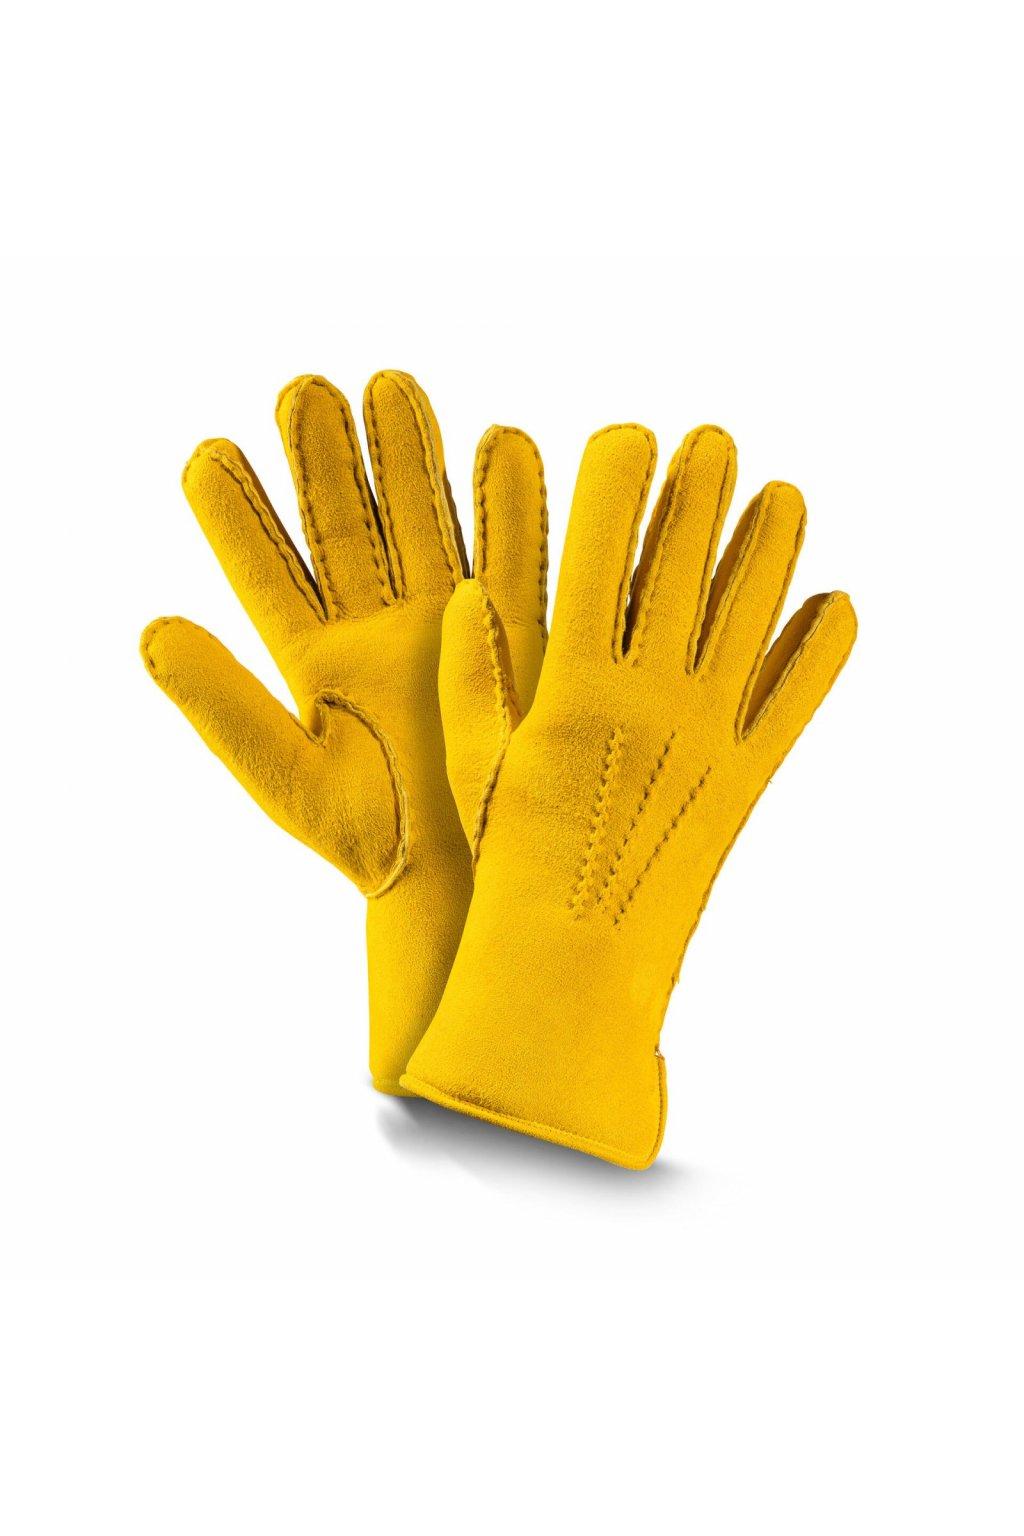 fingerhandschuhe premium curry z2137y3asnjjerr